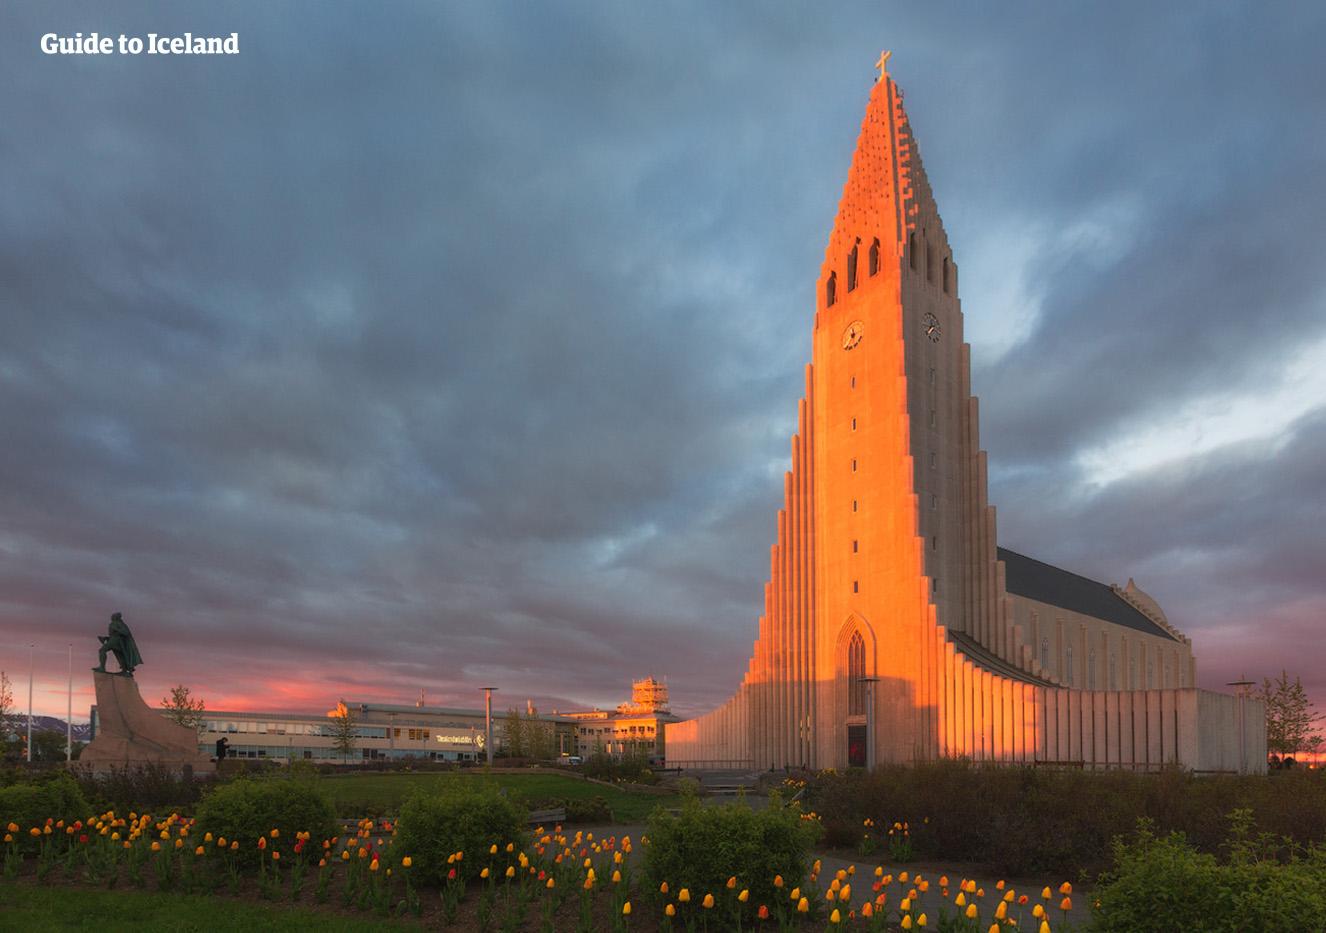 Den majestætiske Hallgrímskirkja i Reykjavík badet i den varme glød fra midnatssolen